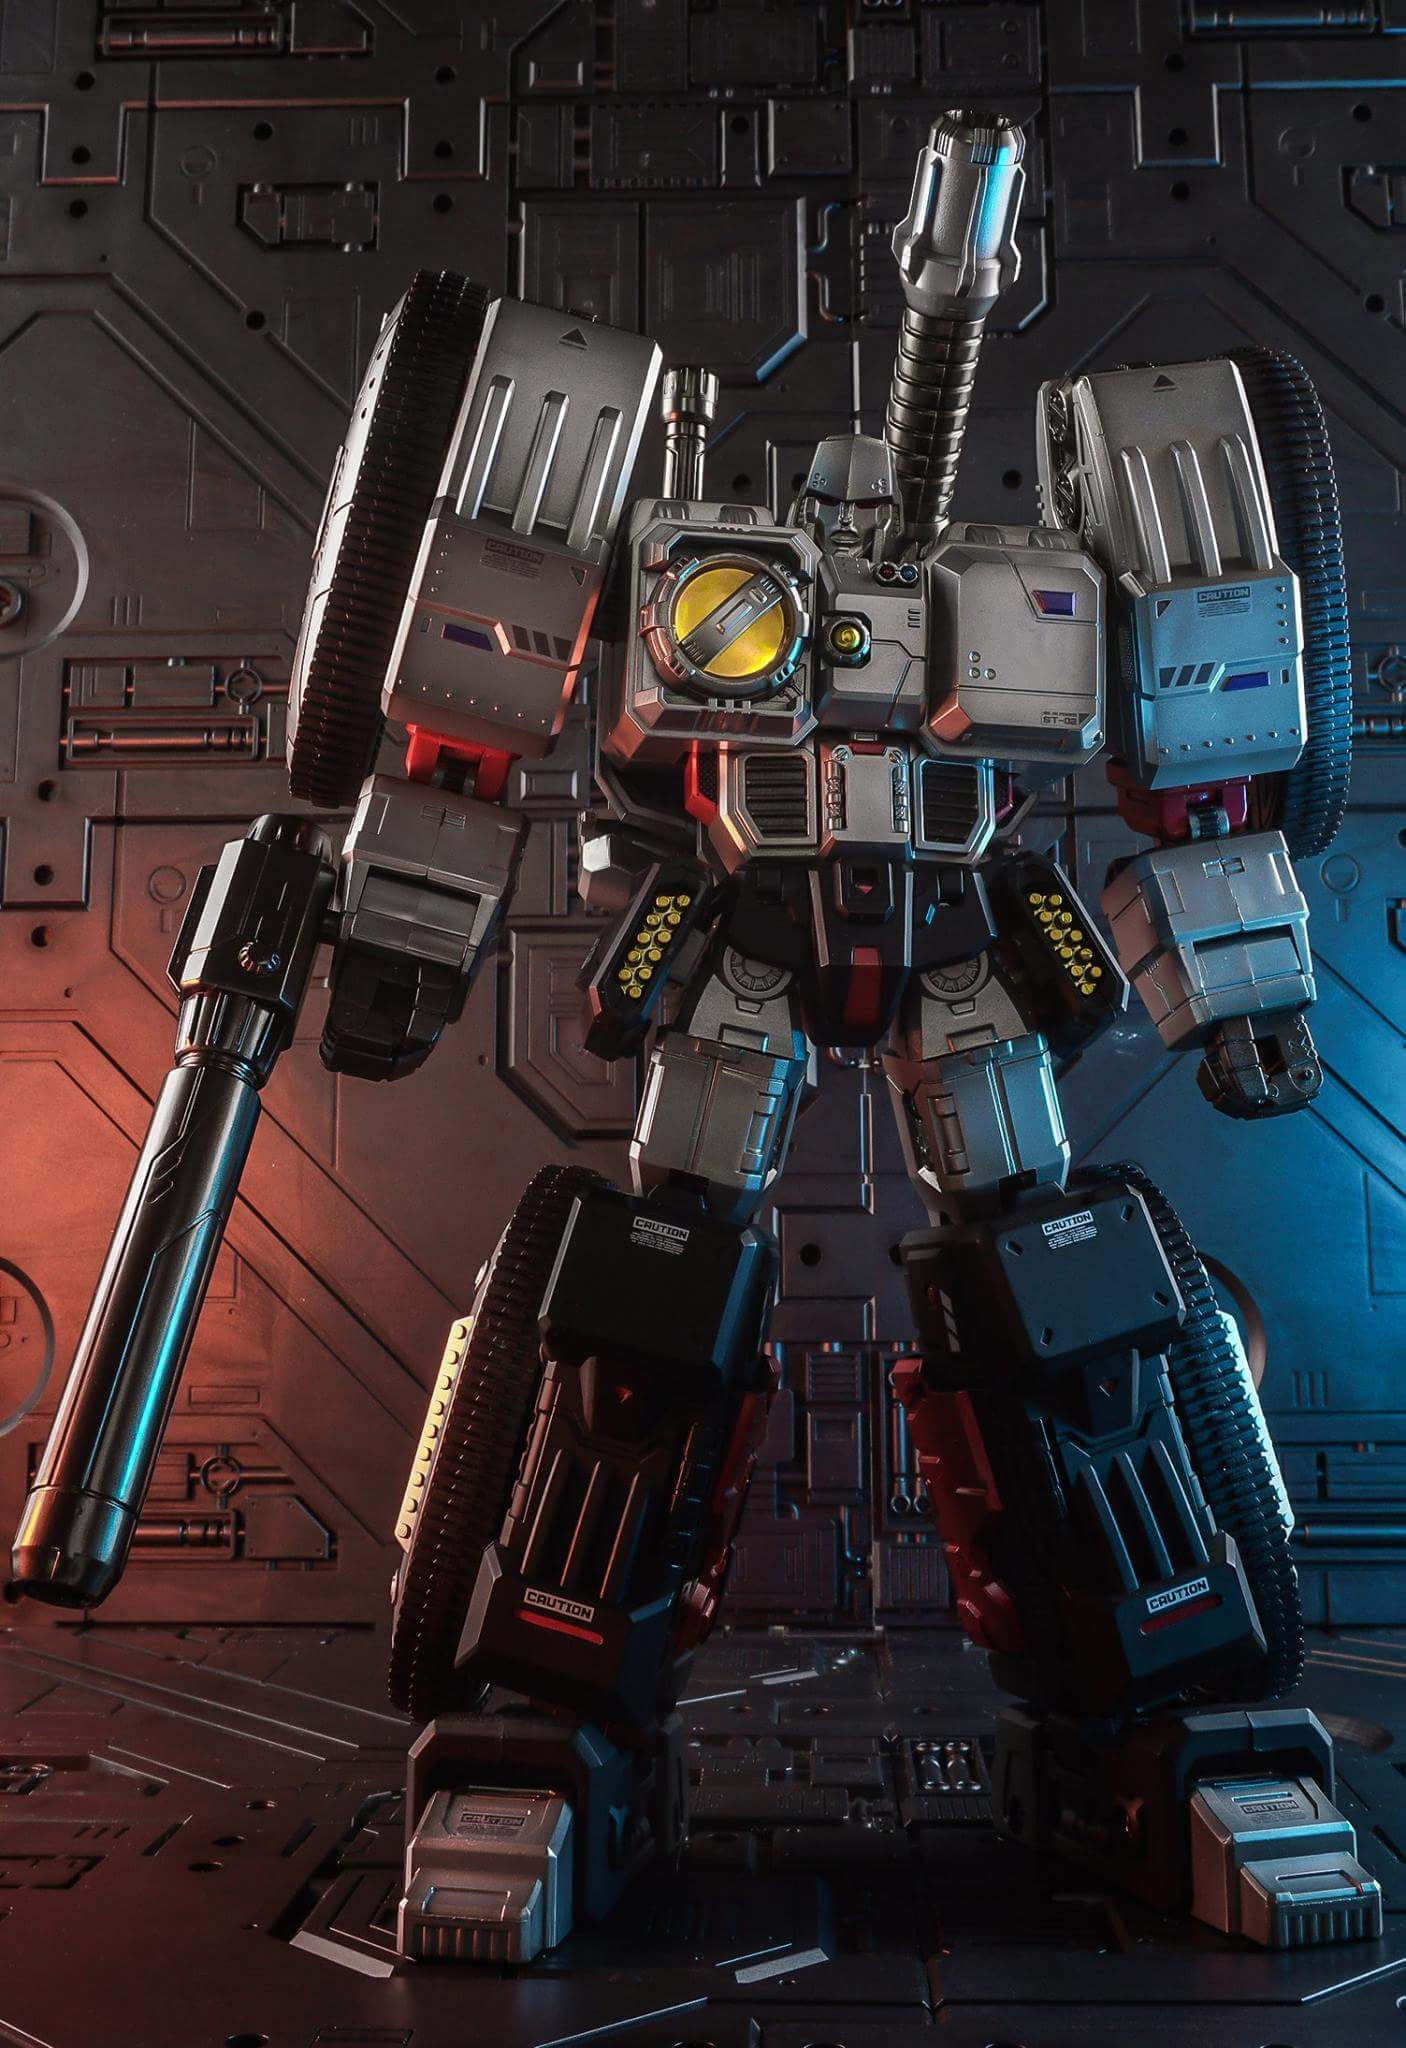 [SparkToys] Produit Tiers - ST - aka War Within: Optimus, Mégatron, Grimlock/La Menace, etc - Page 2 KoIj5rTG